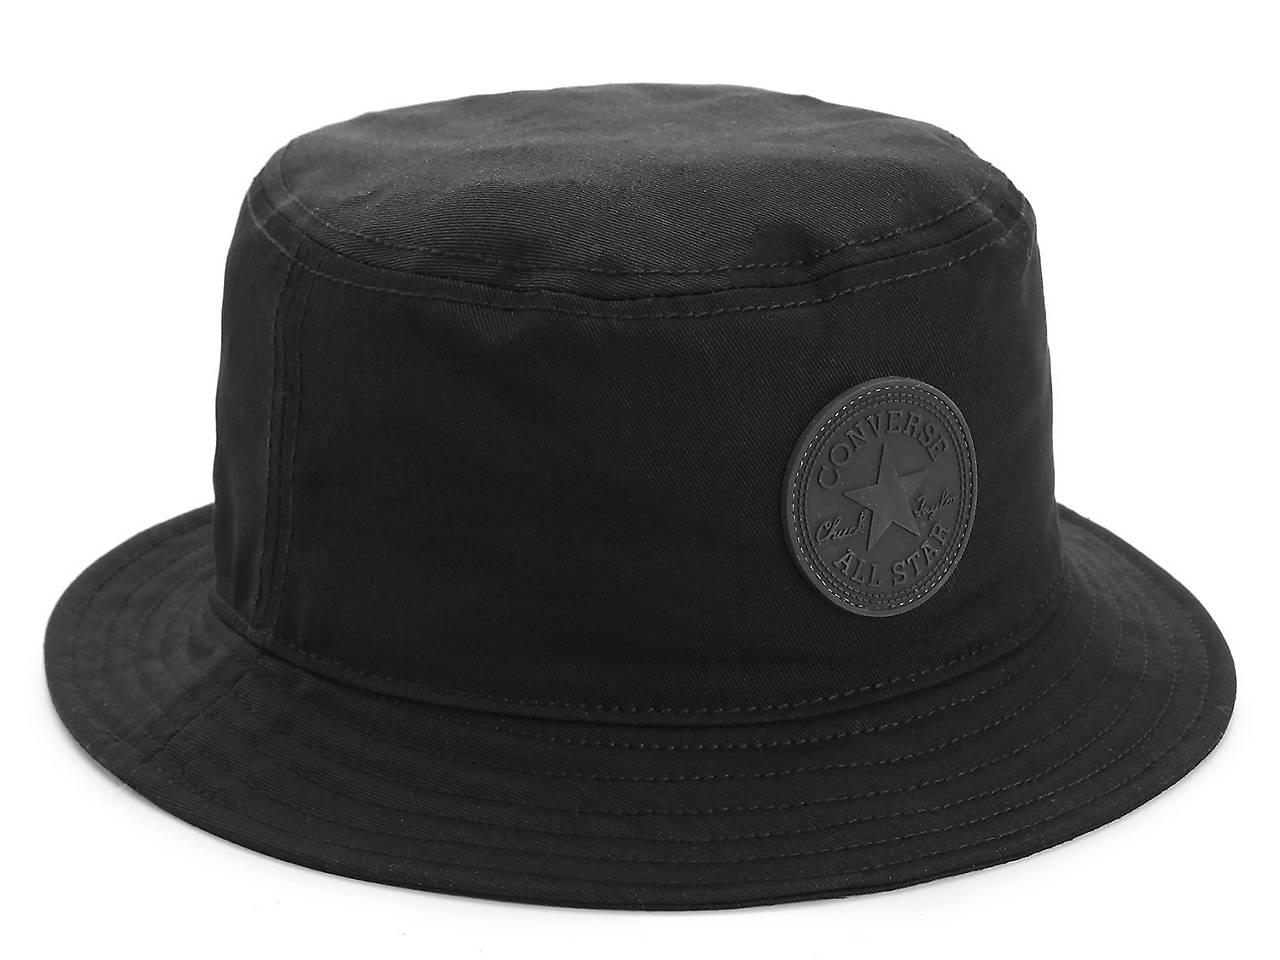 Converse Monochrome Bucket Hat Men s Handbags   Accessories  b80a09abc50